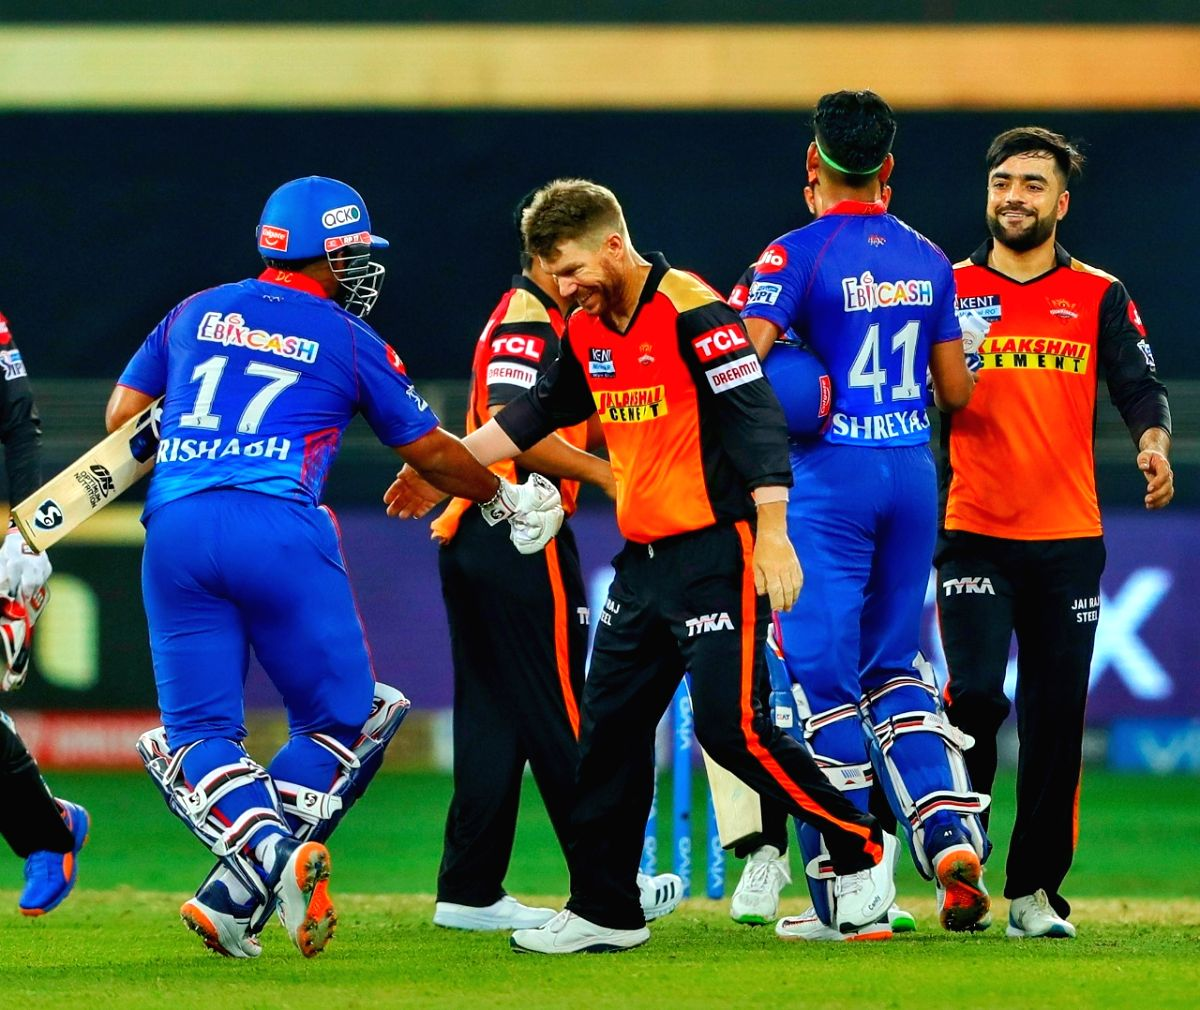 IPL 2021: Delhi continue their good form, register commanding win over Hyderabad (Ld)